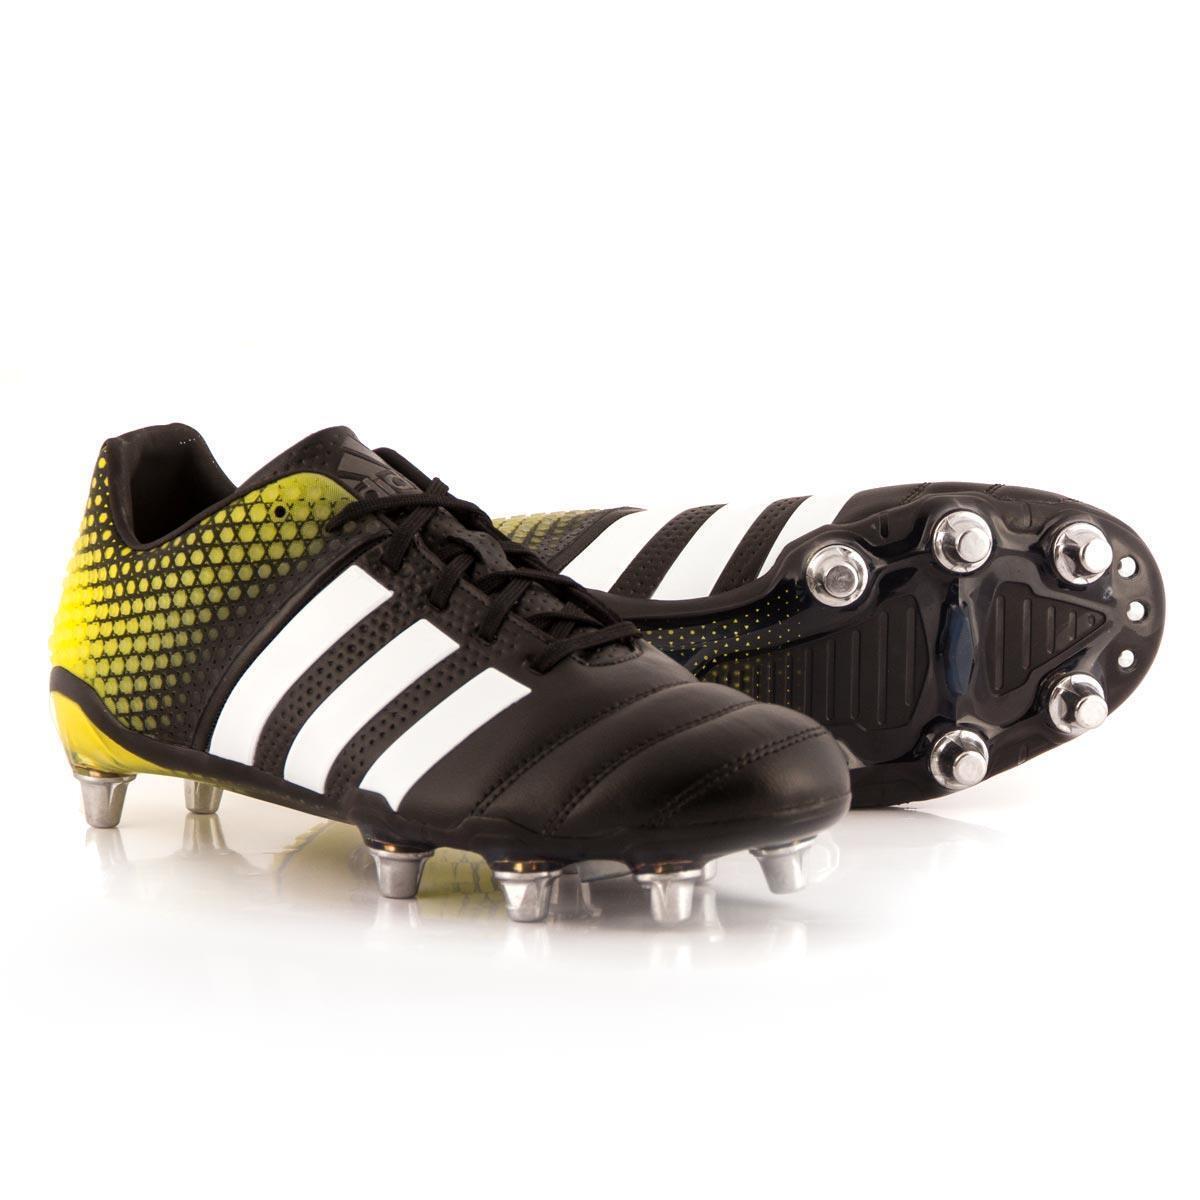 Adidas Adipower Kakari 3.0 boots size  2   bnwt